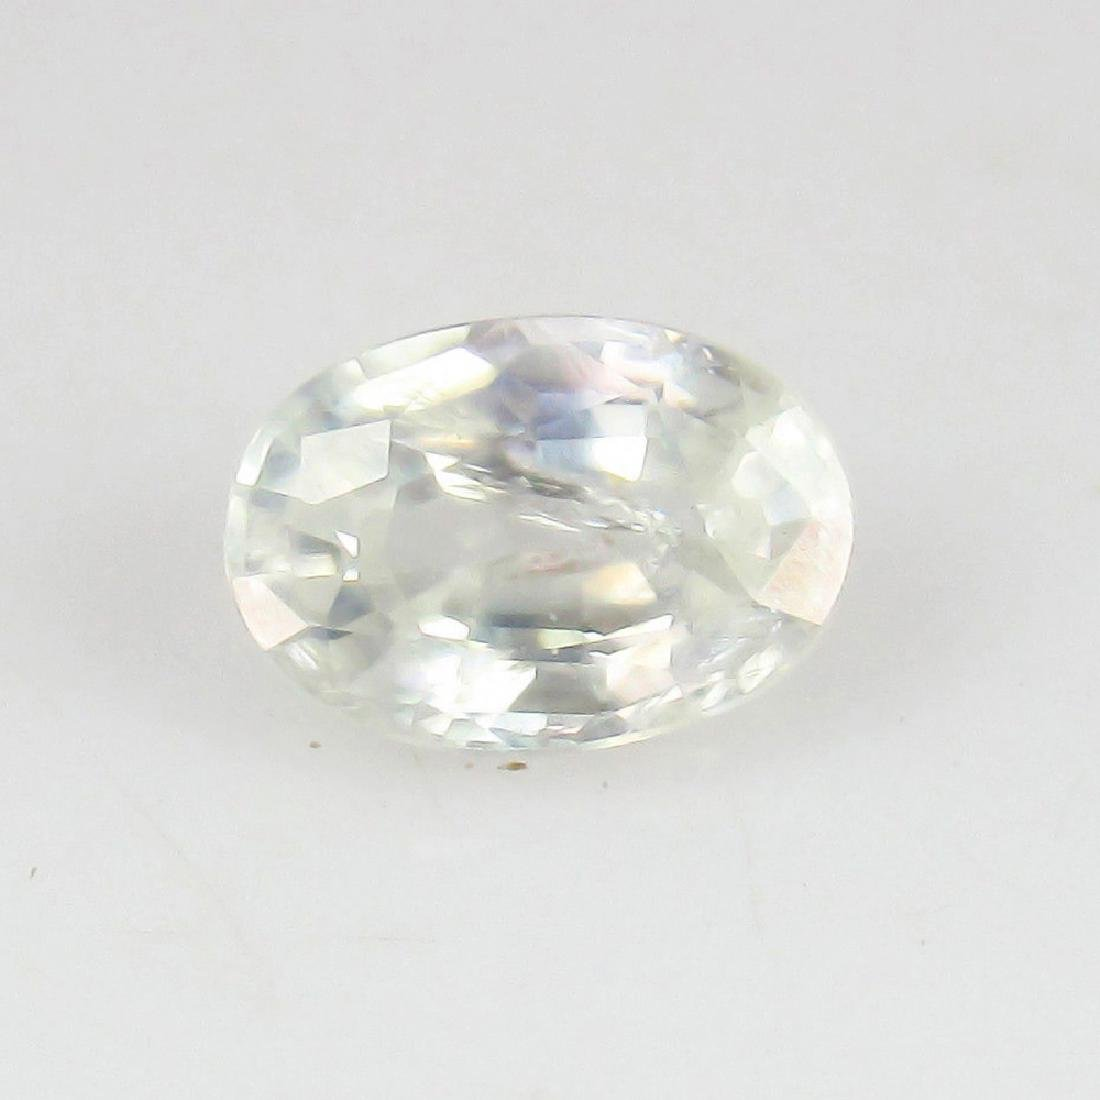 1.18 Ct Genuine Ceylon Unheated White Sapphire 7X5 mm